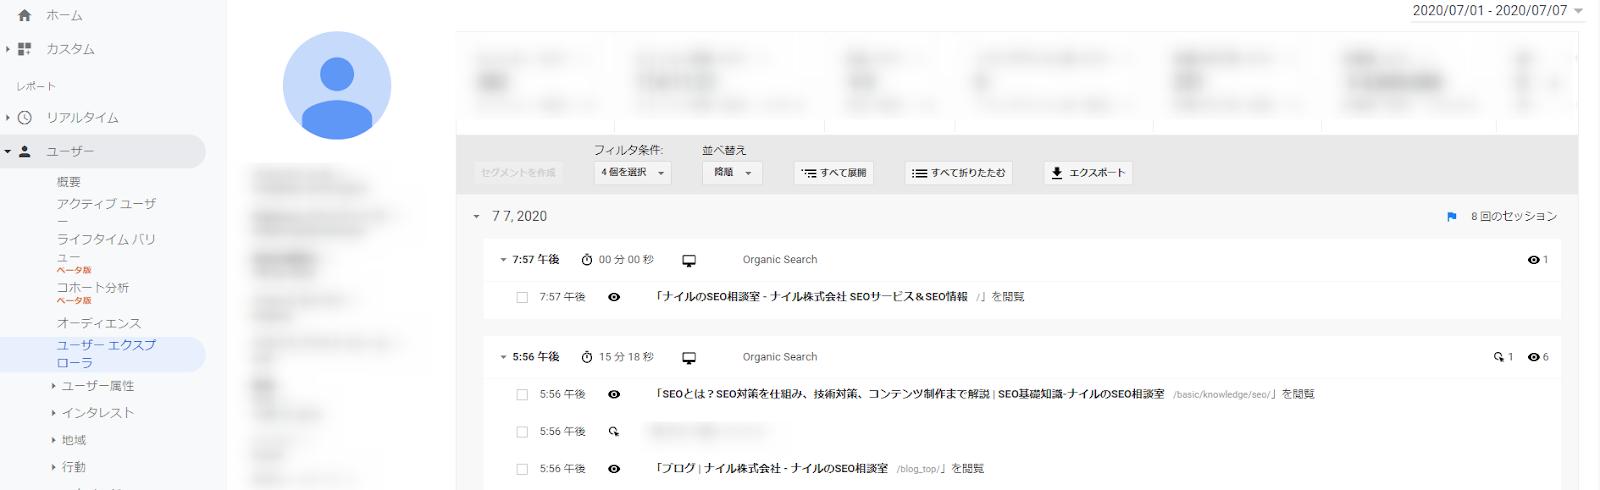 Google Analyticsの「ユーザー」→「ユーザーエクスプローラー」→一覧表示されるクライアントID